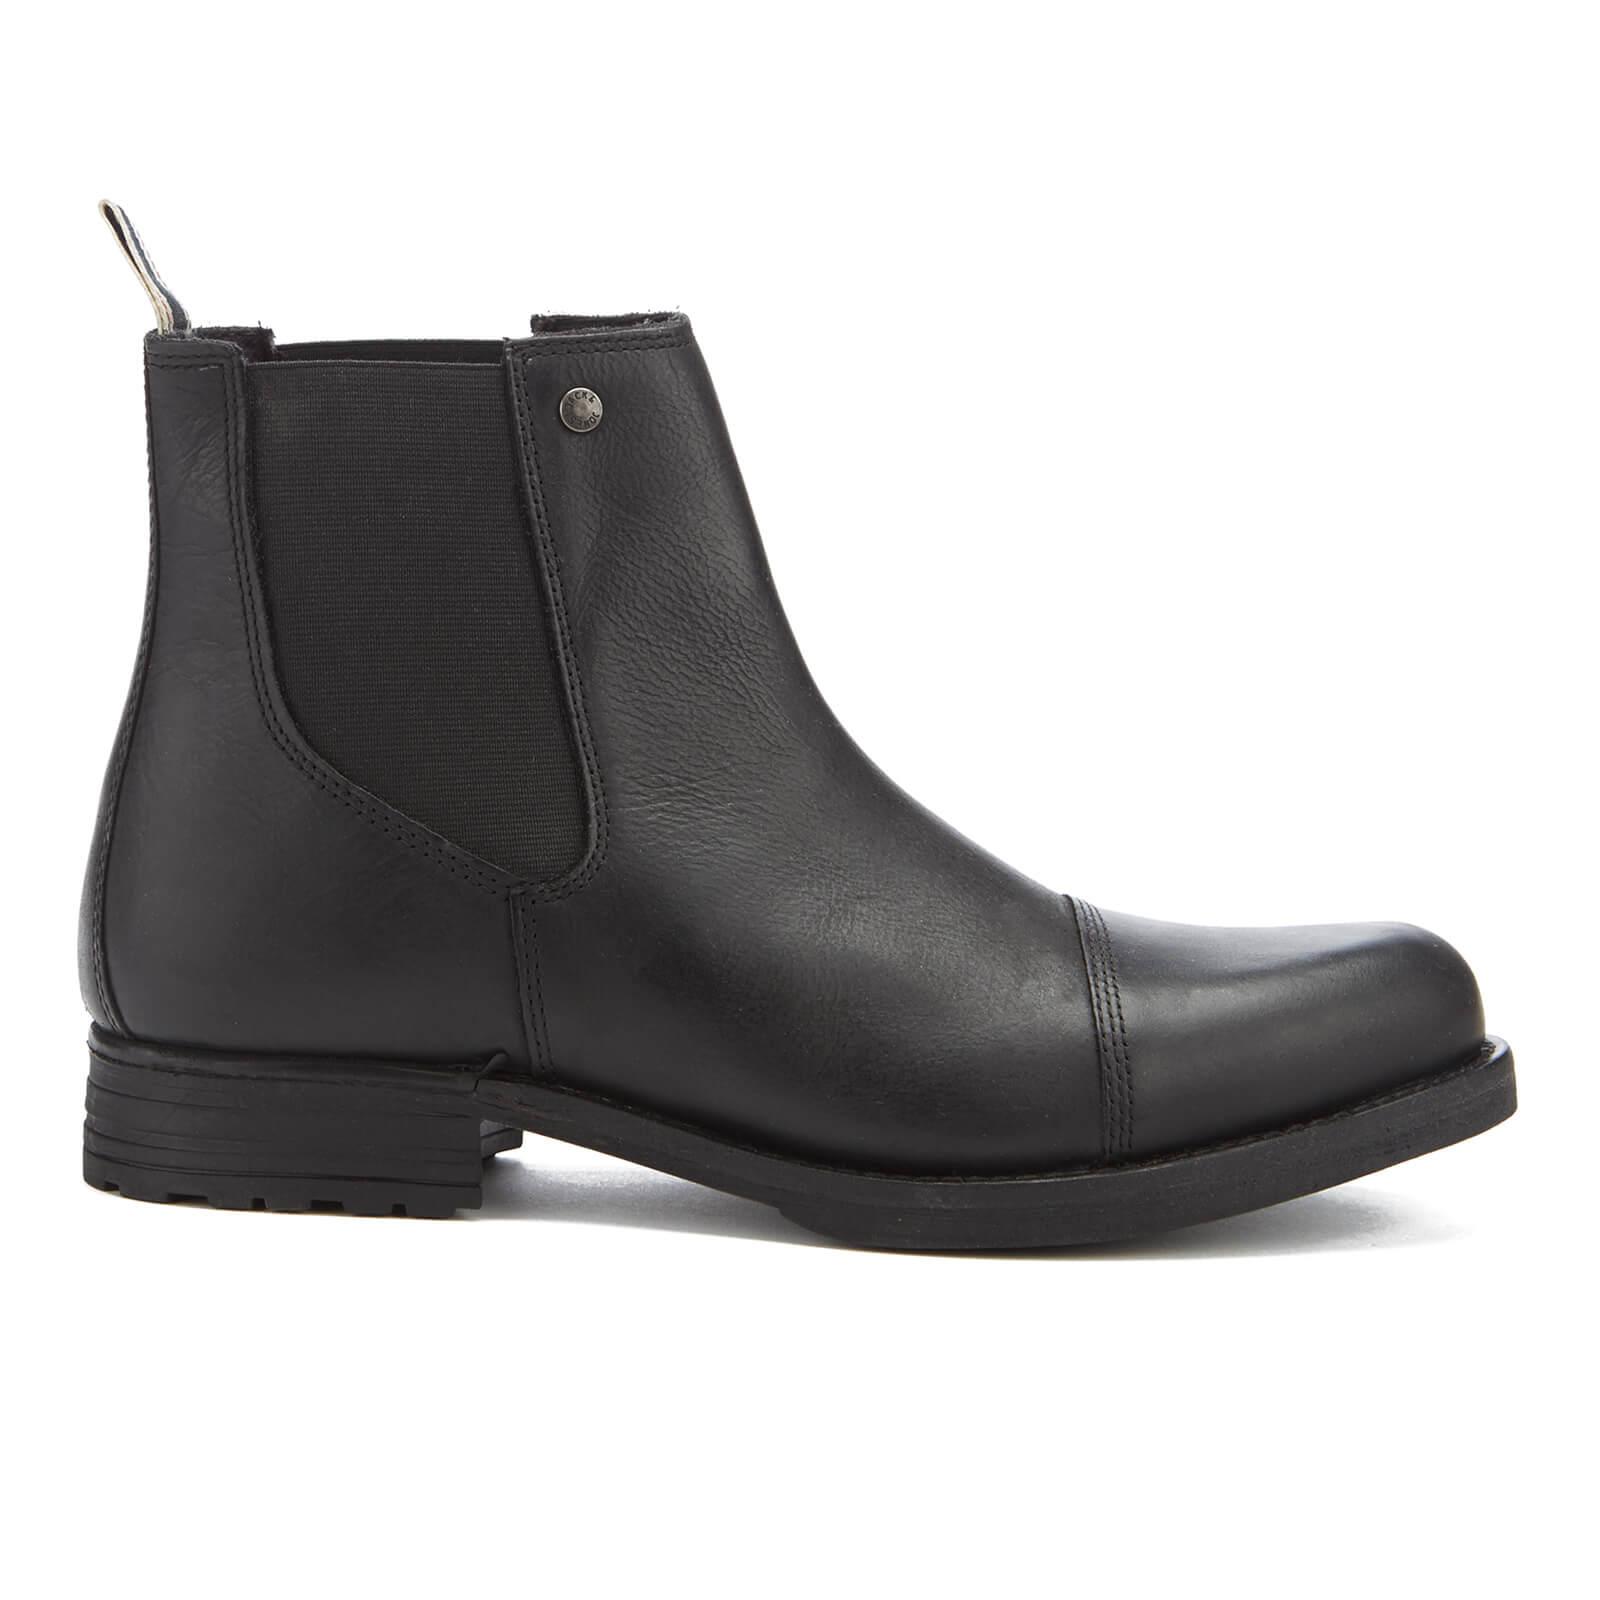 365ccd3a260 Bottines Simon Chelsea Homme Jack   Jones -Anthracite Mens Footwear ...